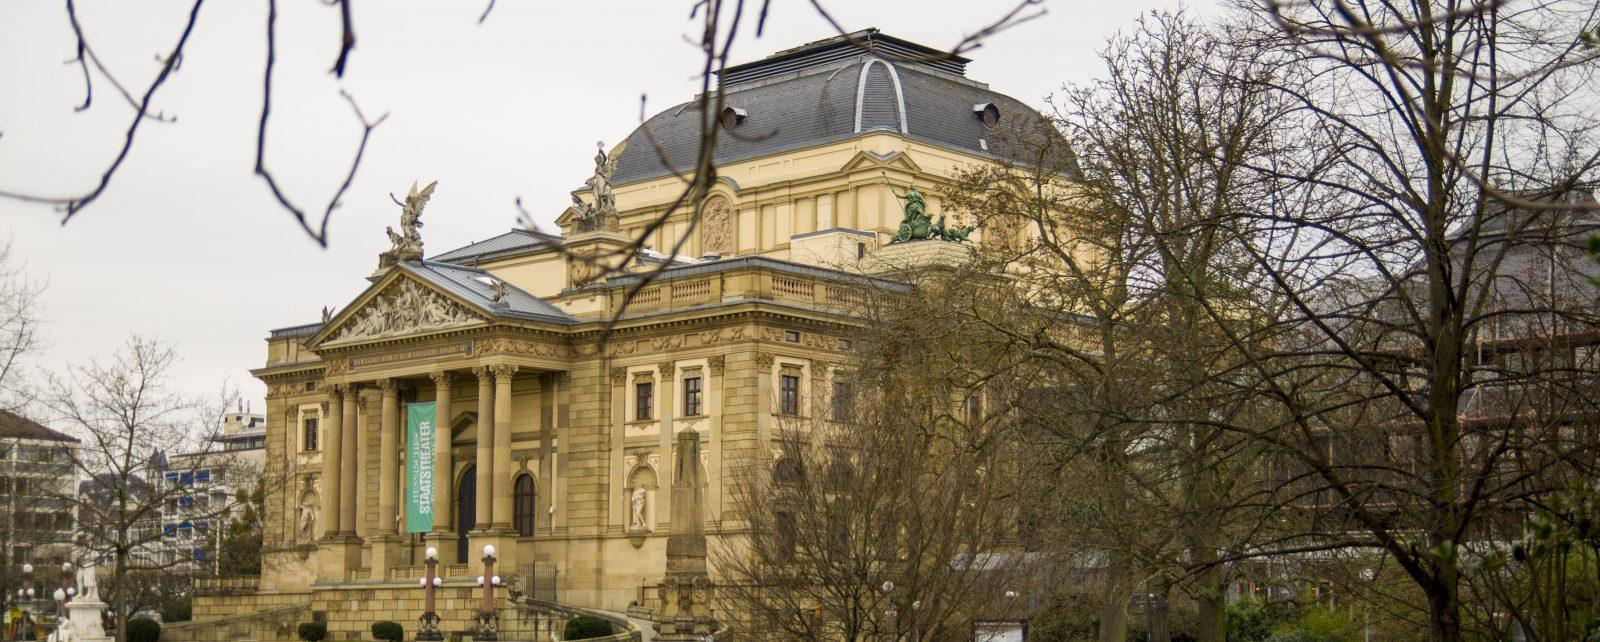 Immobilienmakler in Wiesbaden